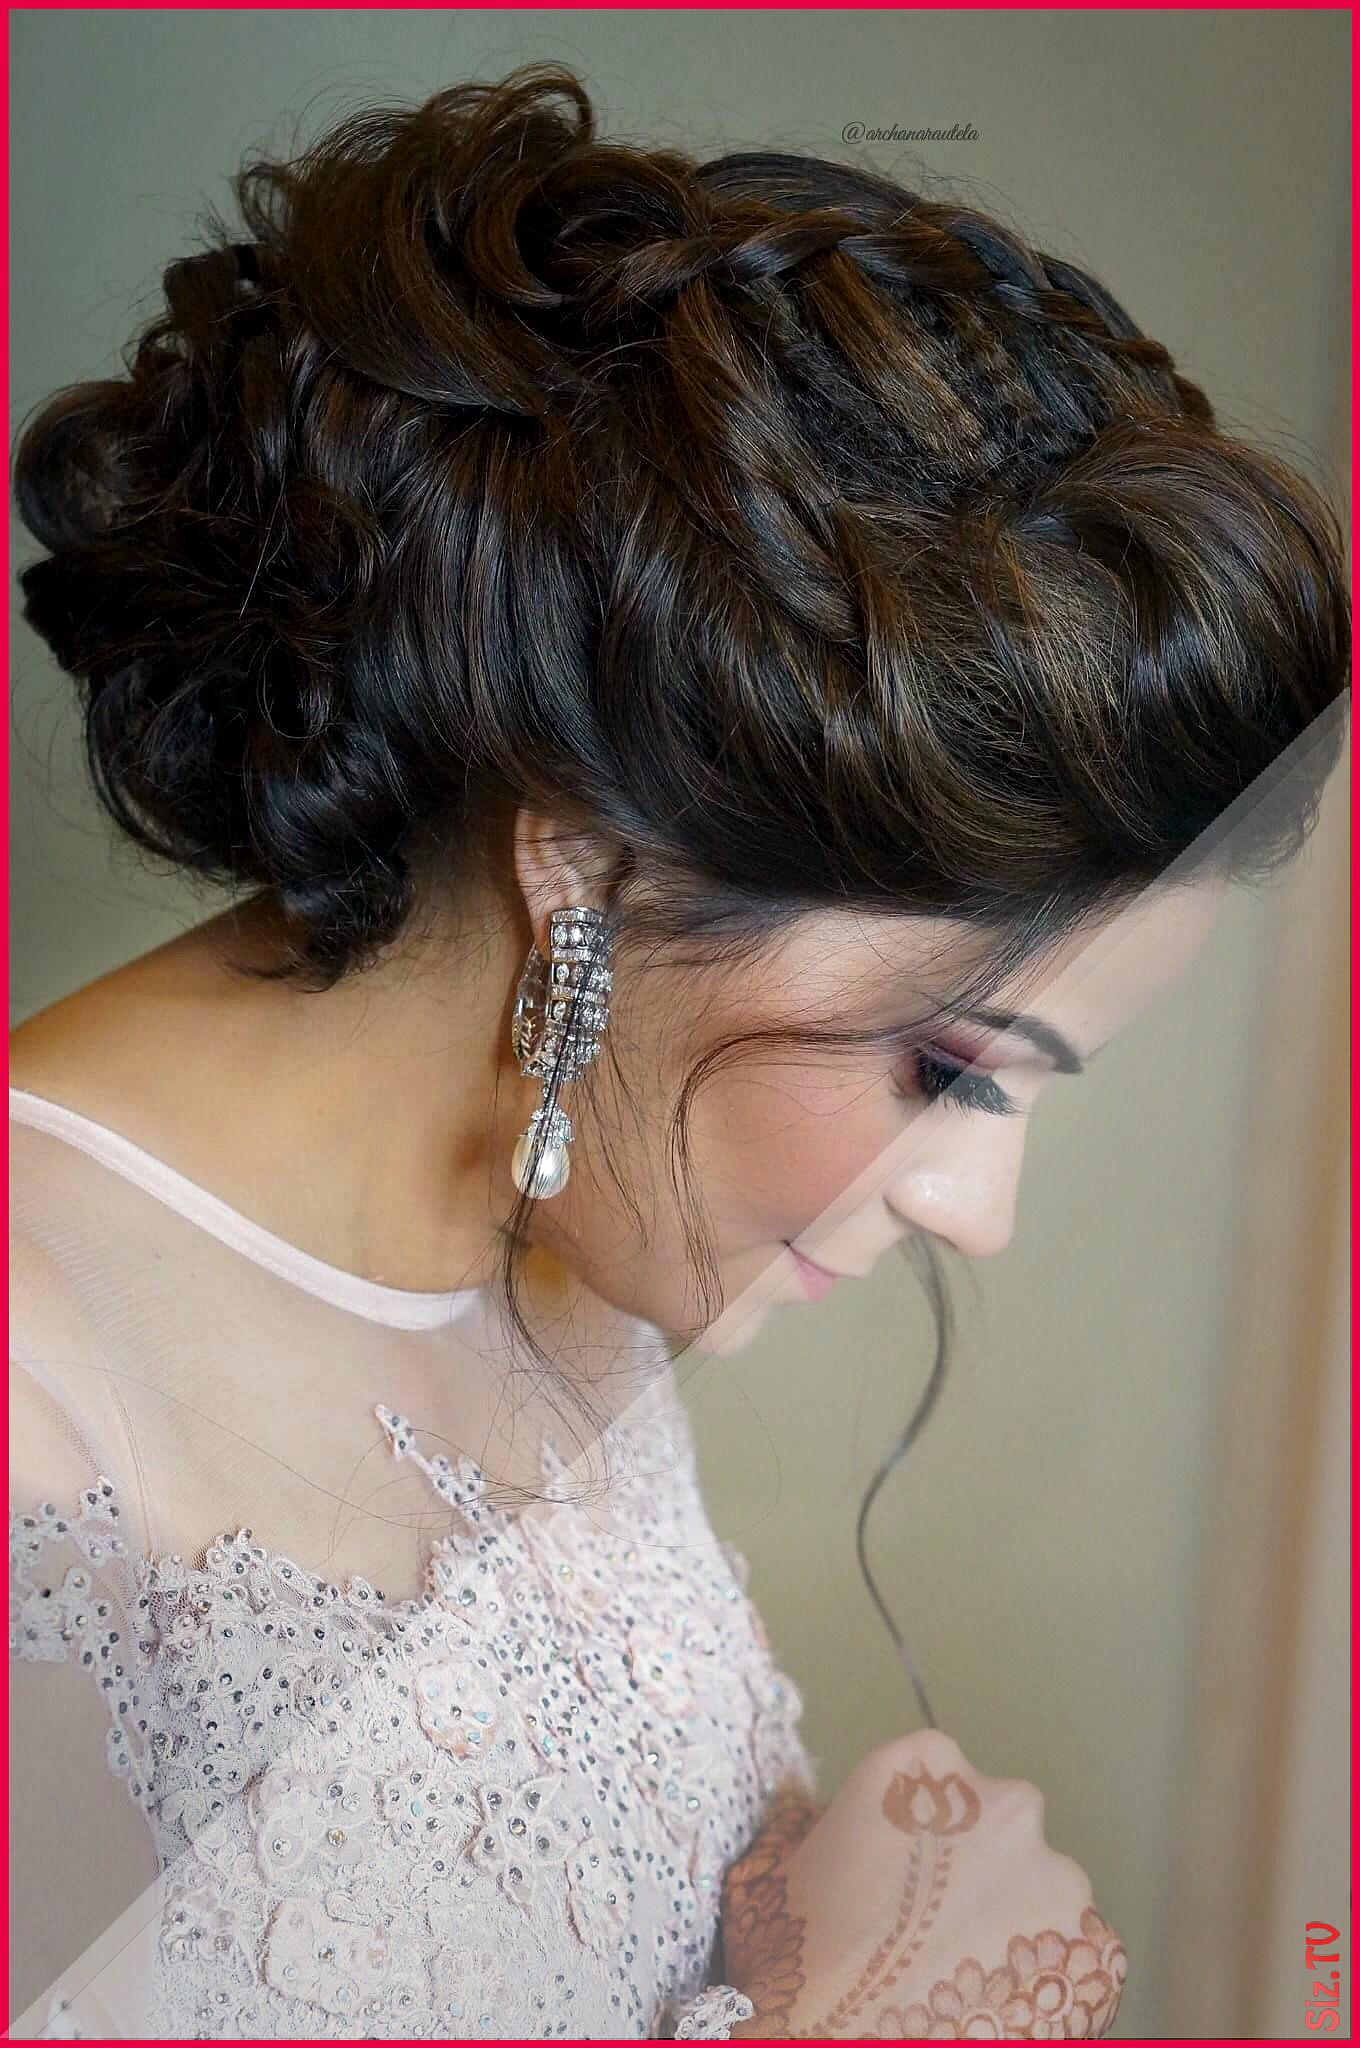 17 Sensational Messy Bun Hairstyles With Gajra 17 Sensational Messy Bun Hairstyles With Gajra Hairstyles Messy Bun Hairstyles Bun Hairstyles Messy Hairstyles